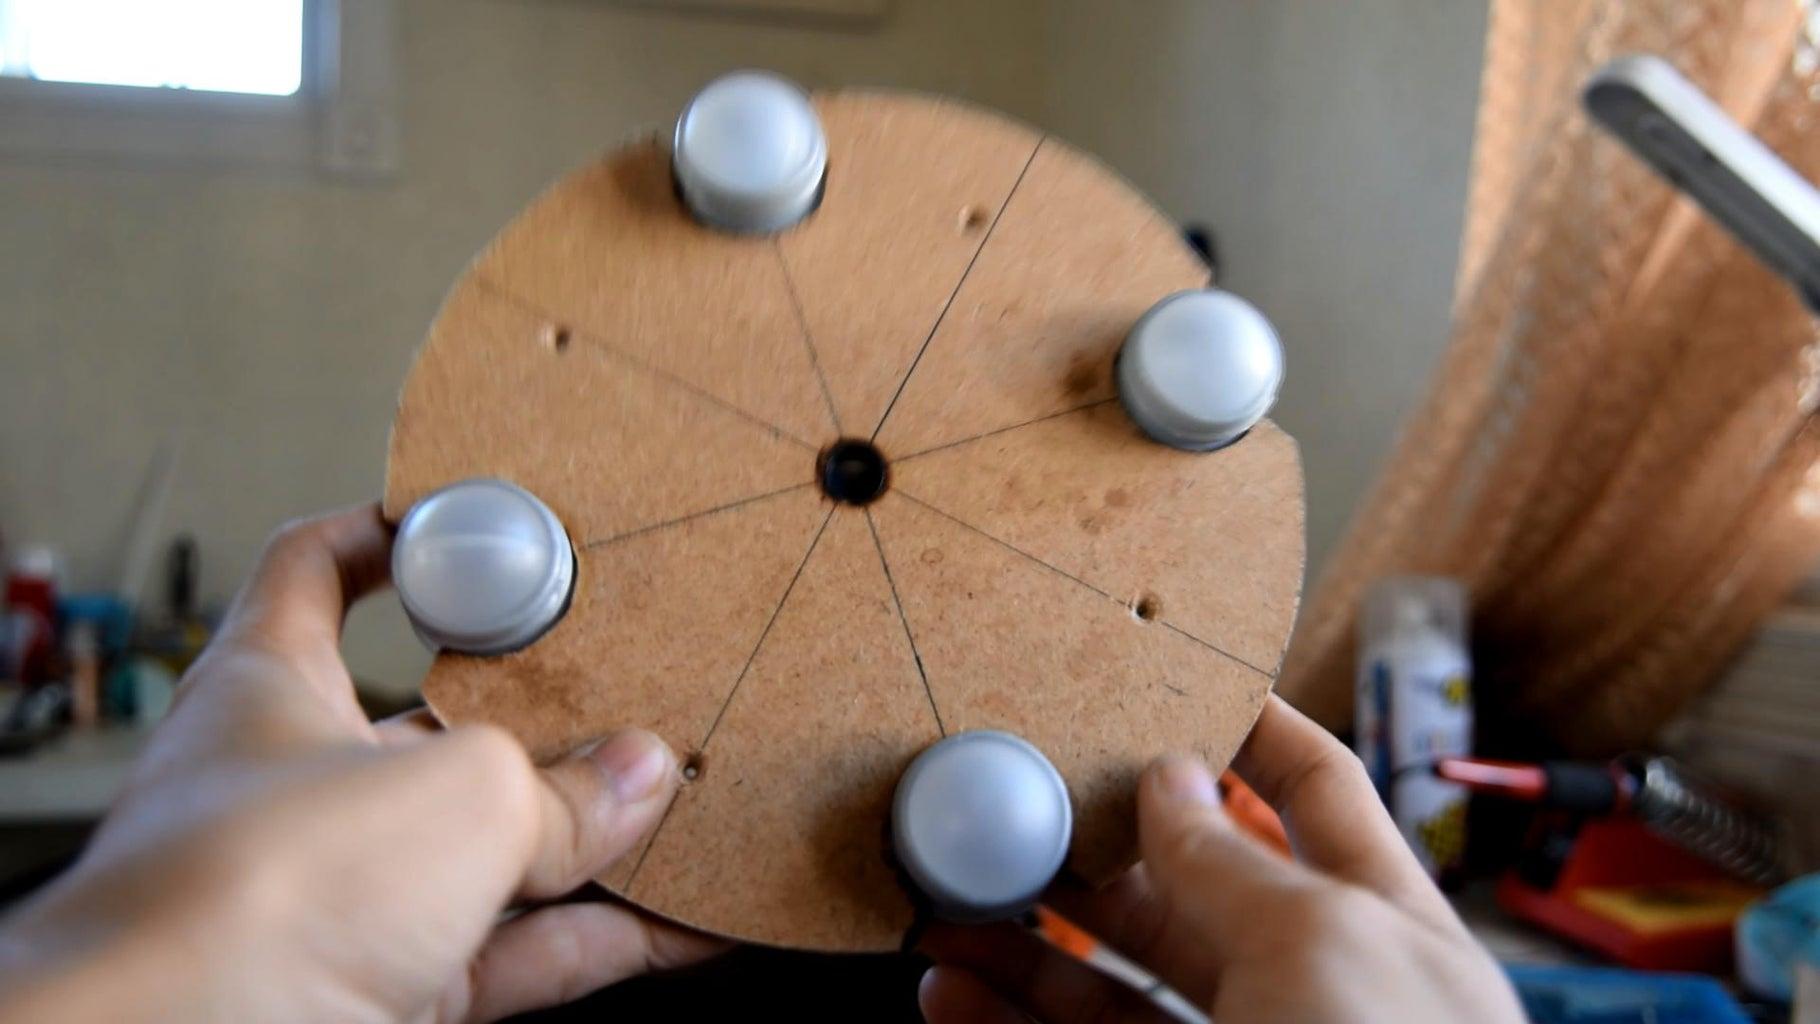 Build BB8's Internal Magnetic Head Mechanism